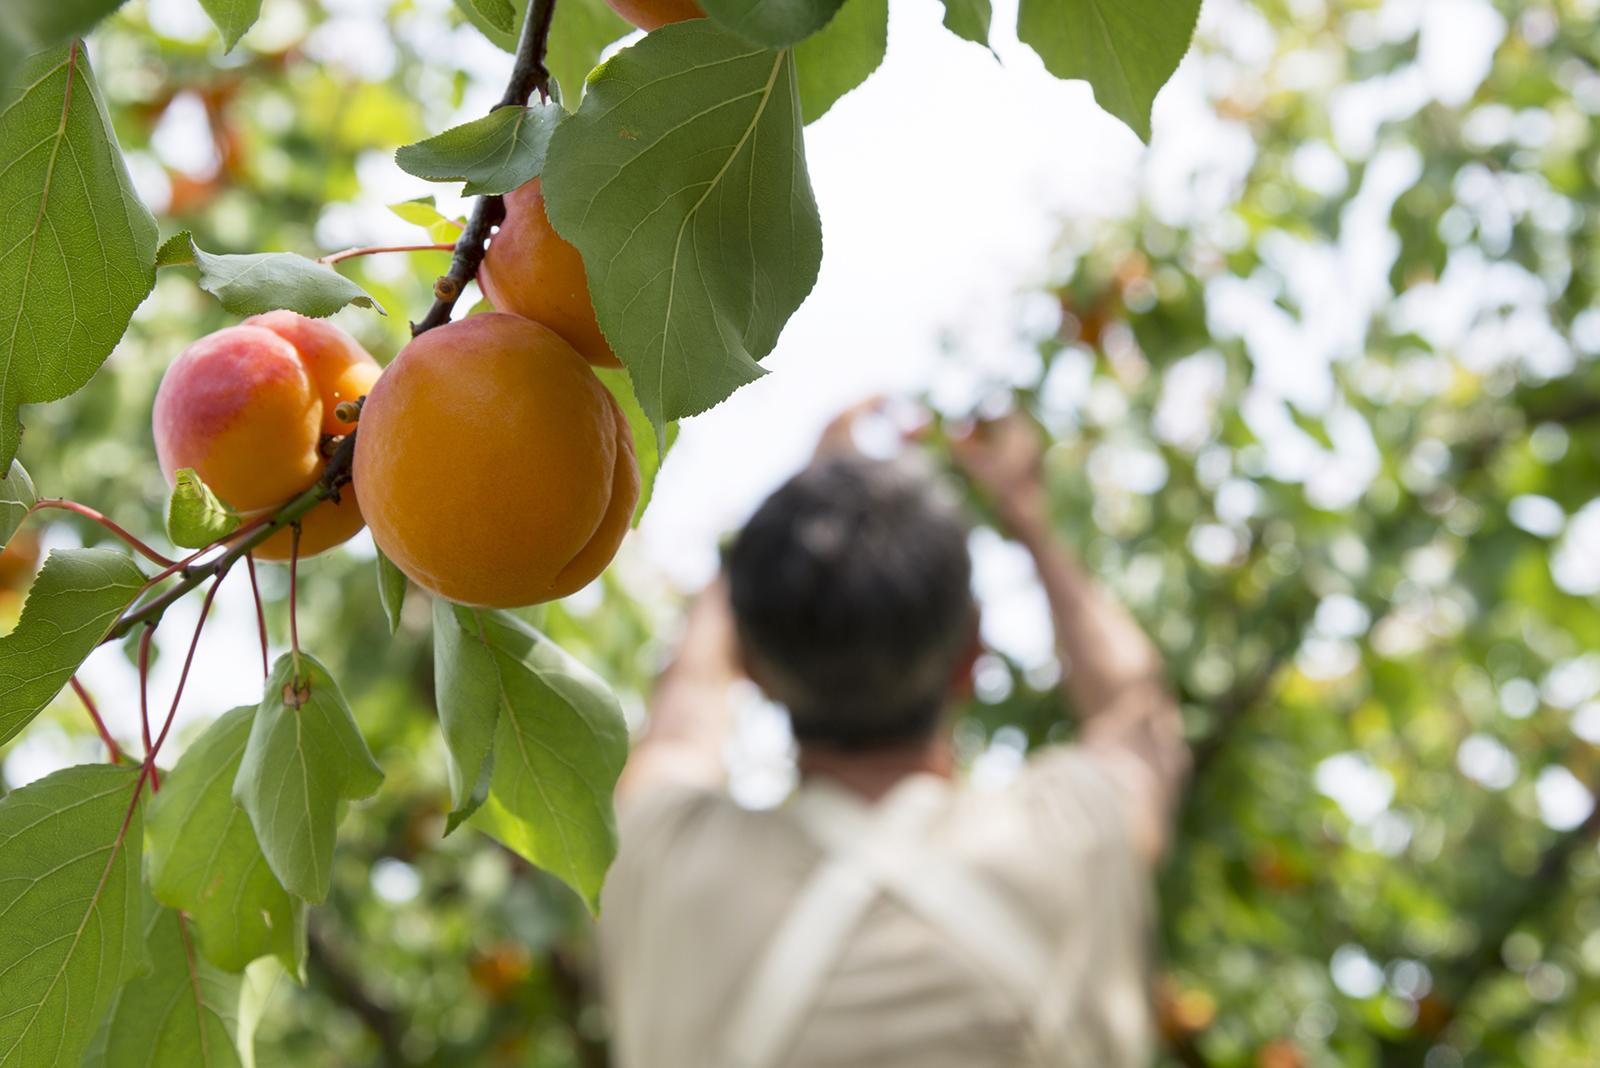 reportage agricole abricot